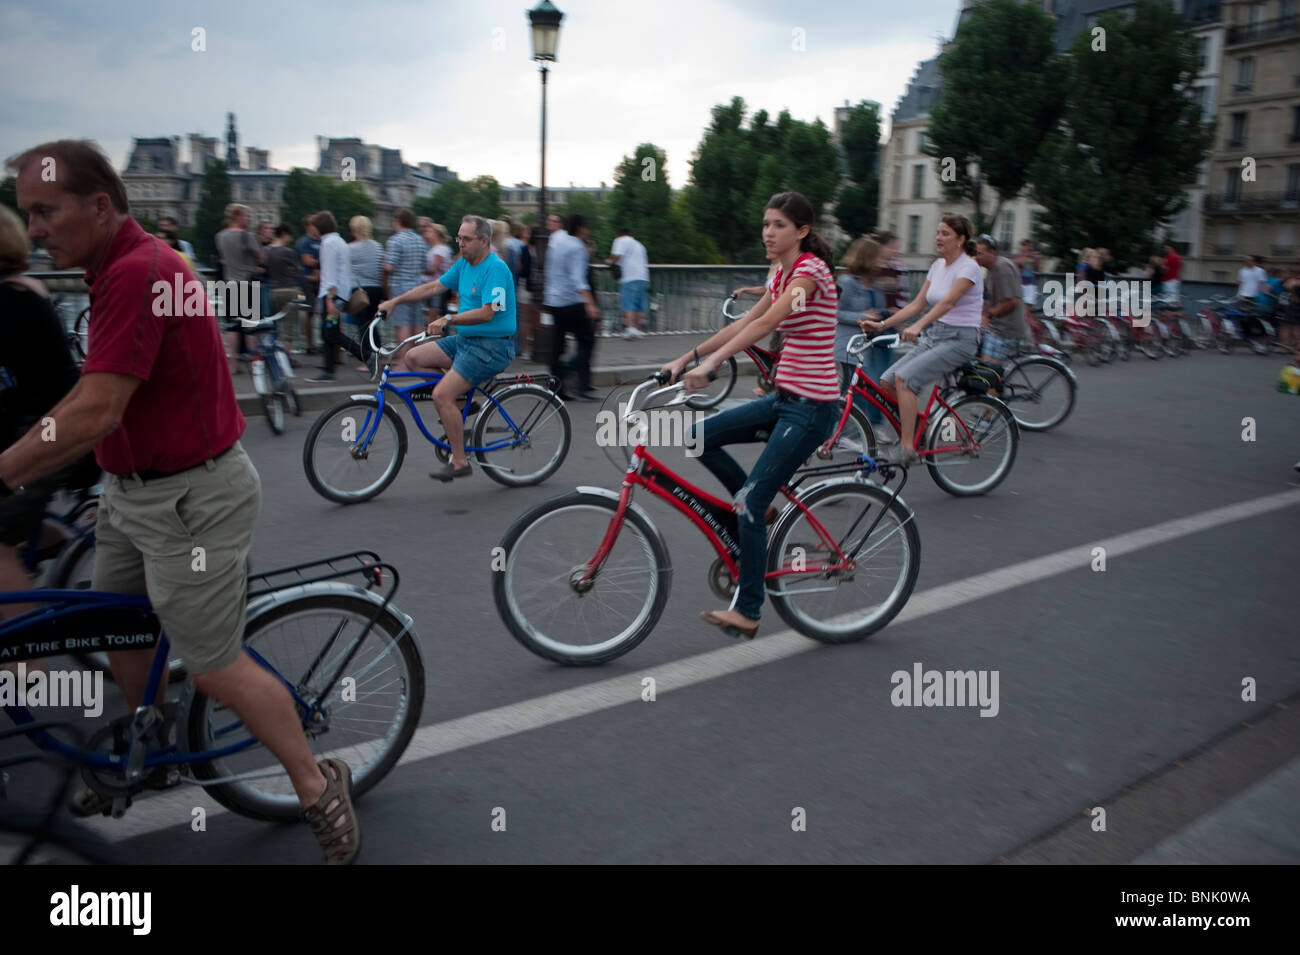 Paris Bike Tours, Group of Adult Tourists Visiting on ('Pont Saint Louis Bridge'), Biking, Ile Saint Louis, - Stock Image